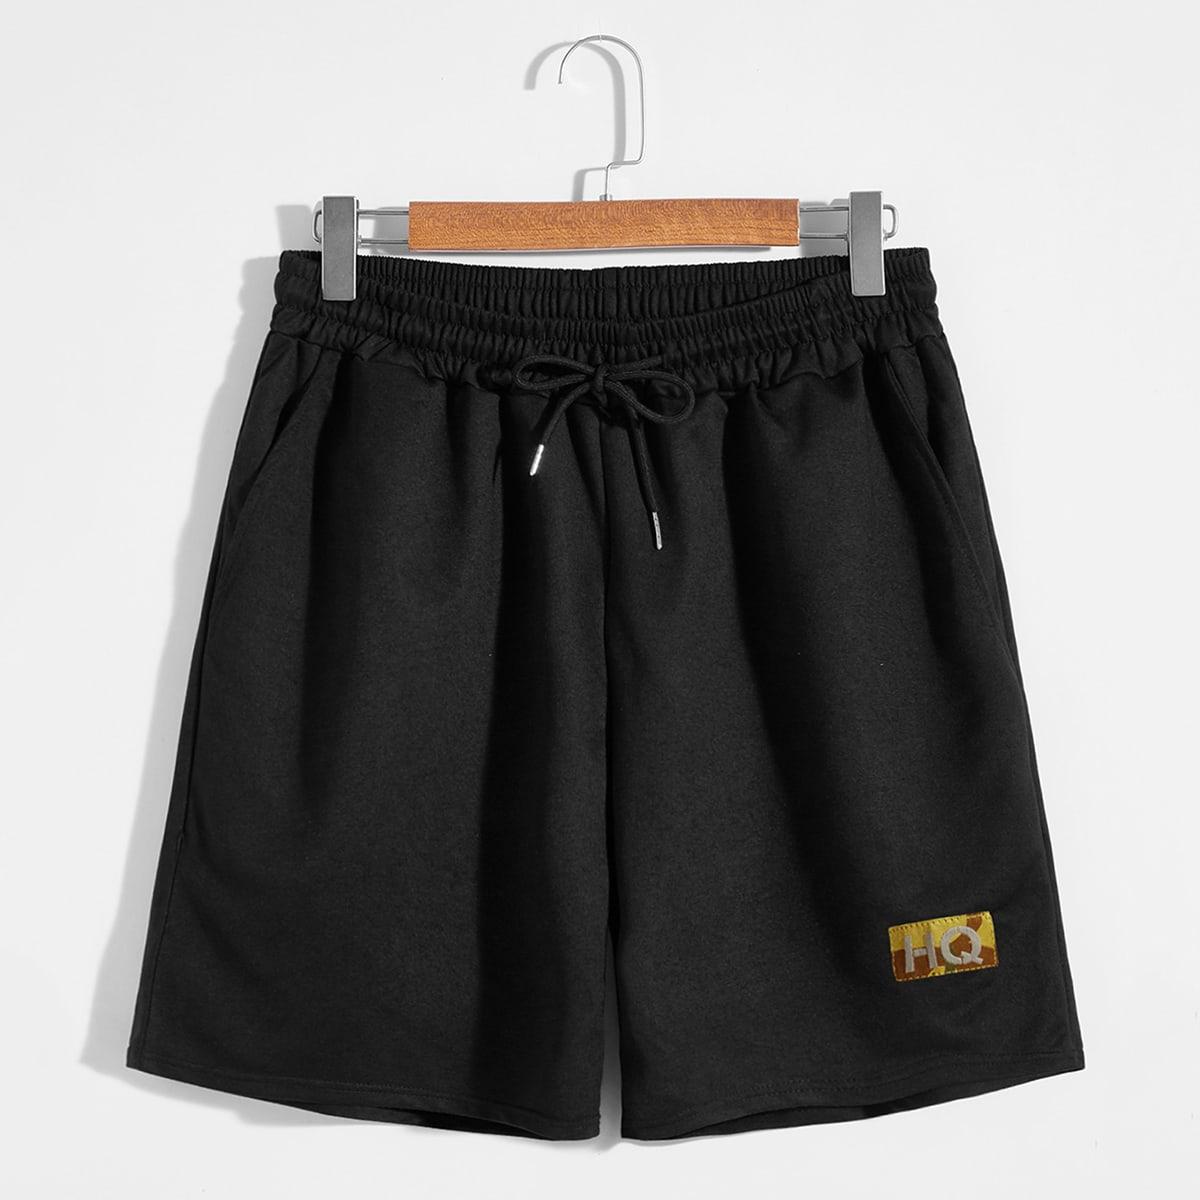 Аппликация буква институтский мужские шорты